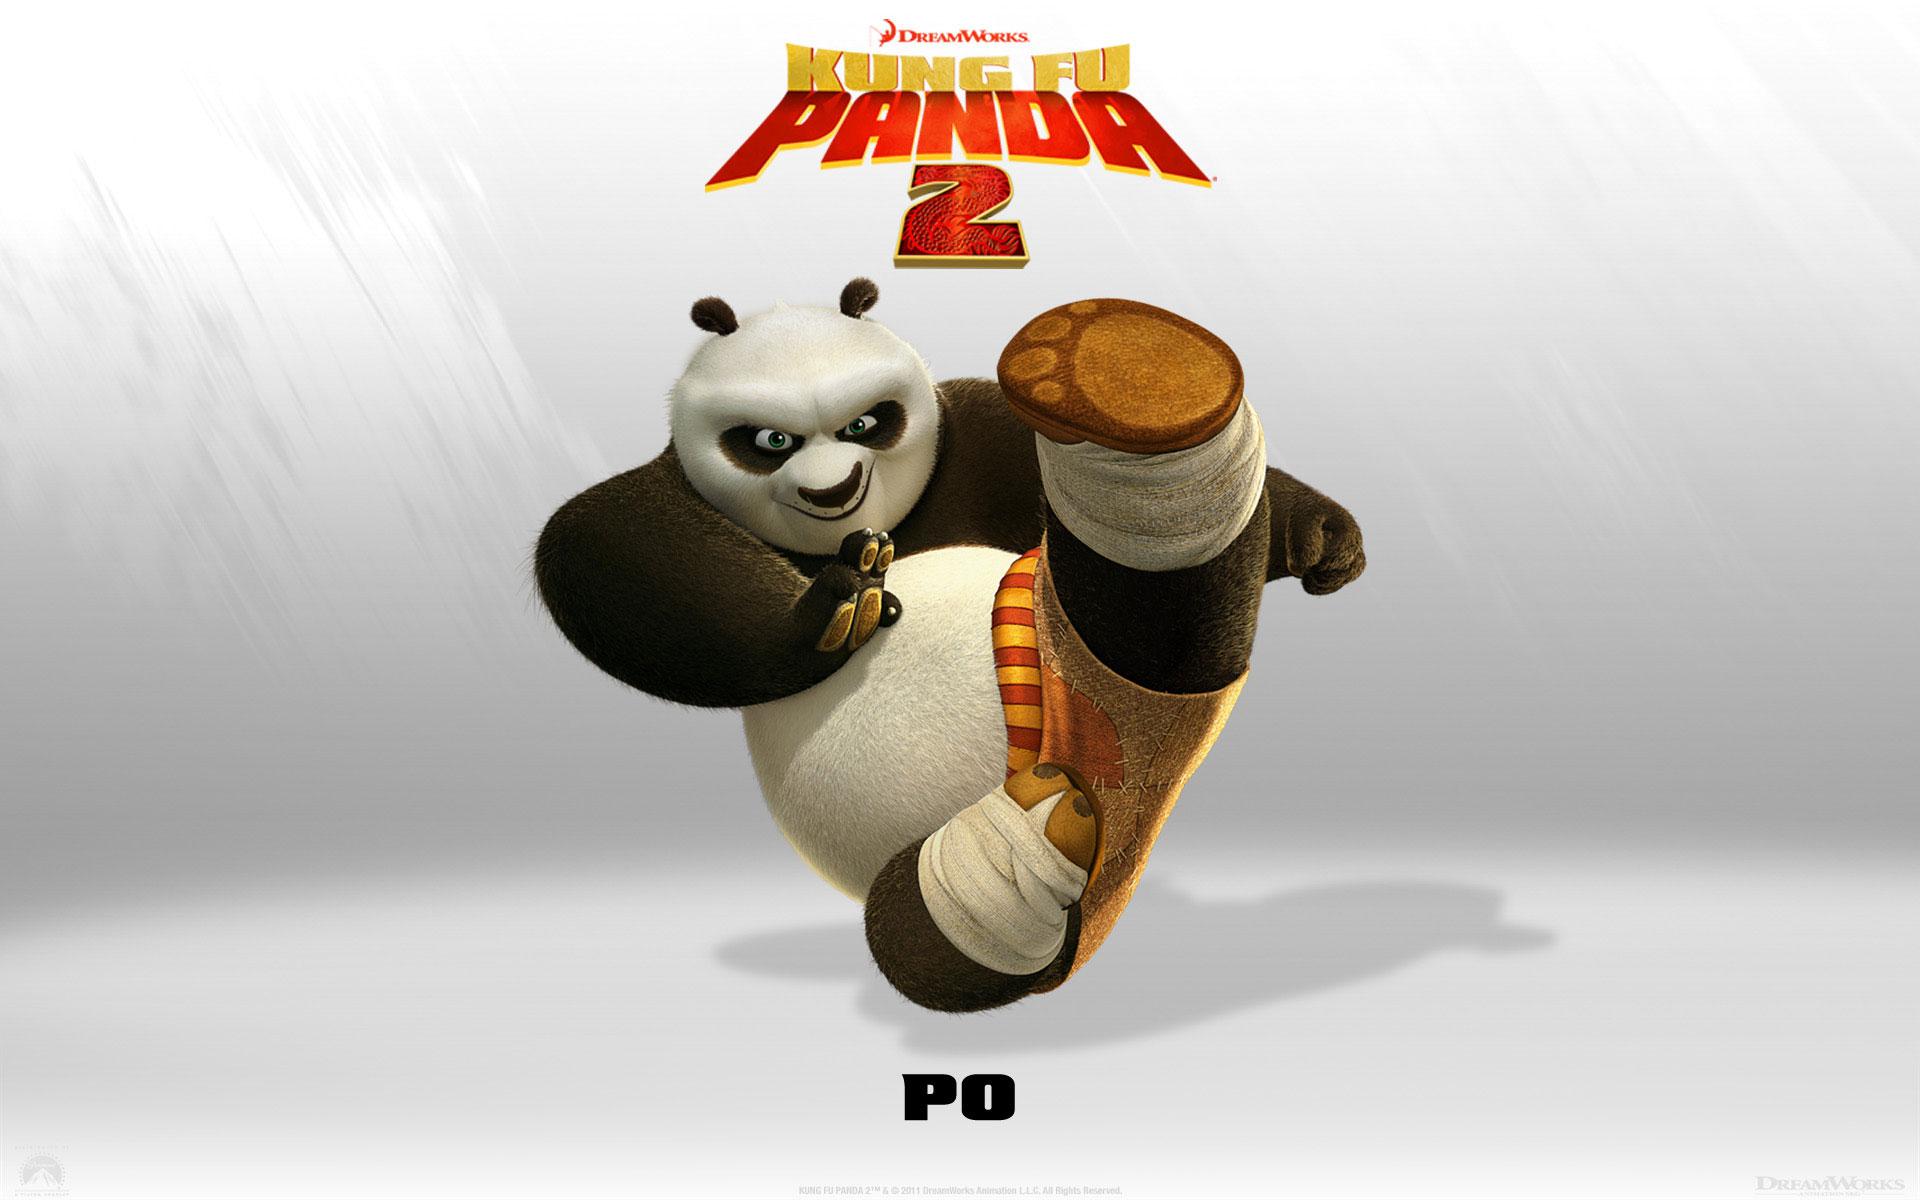 kung-fu-panda-2-po-wallpaper-7581-7874-hd-wallpapers